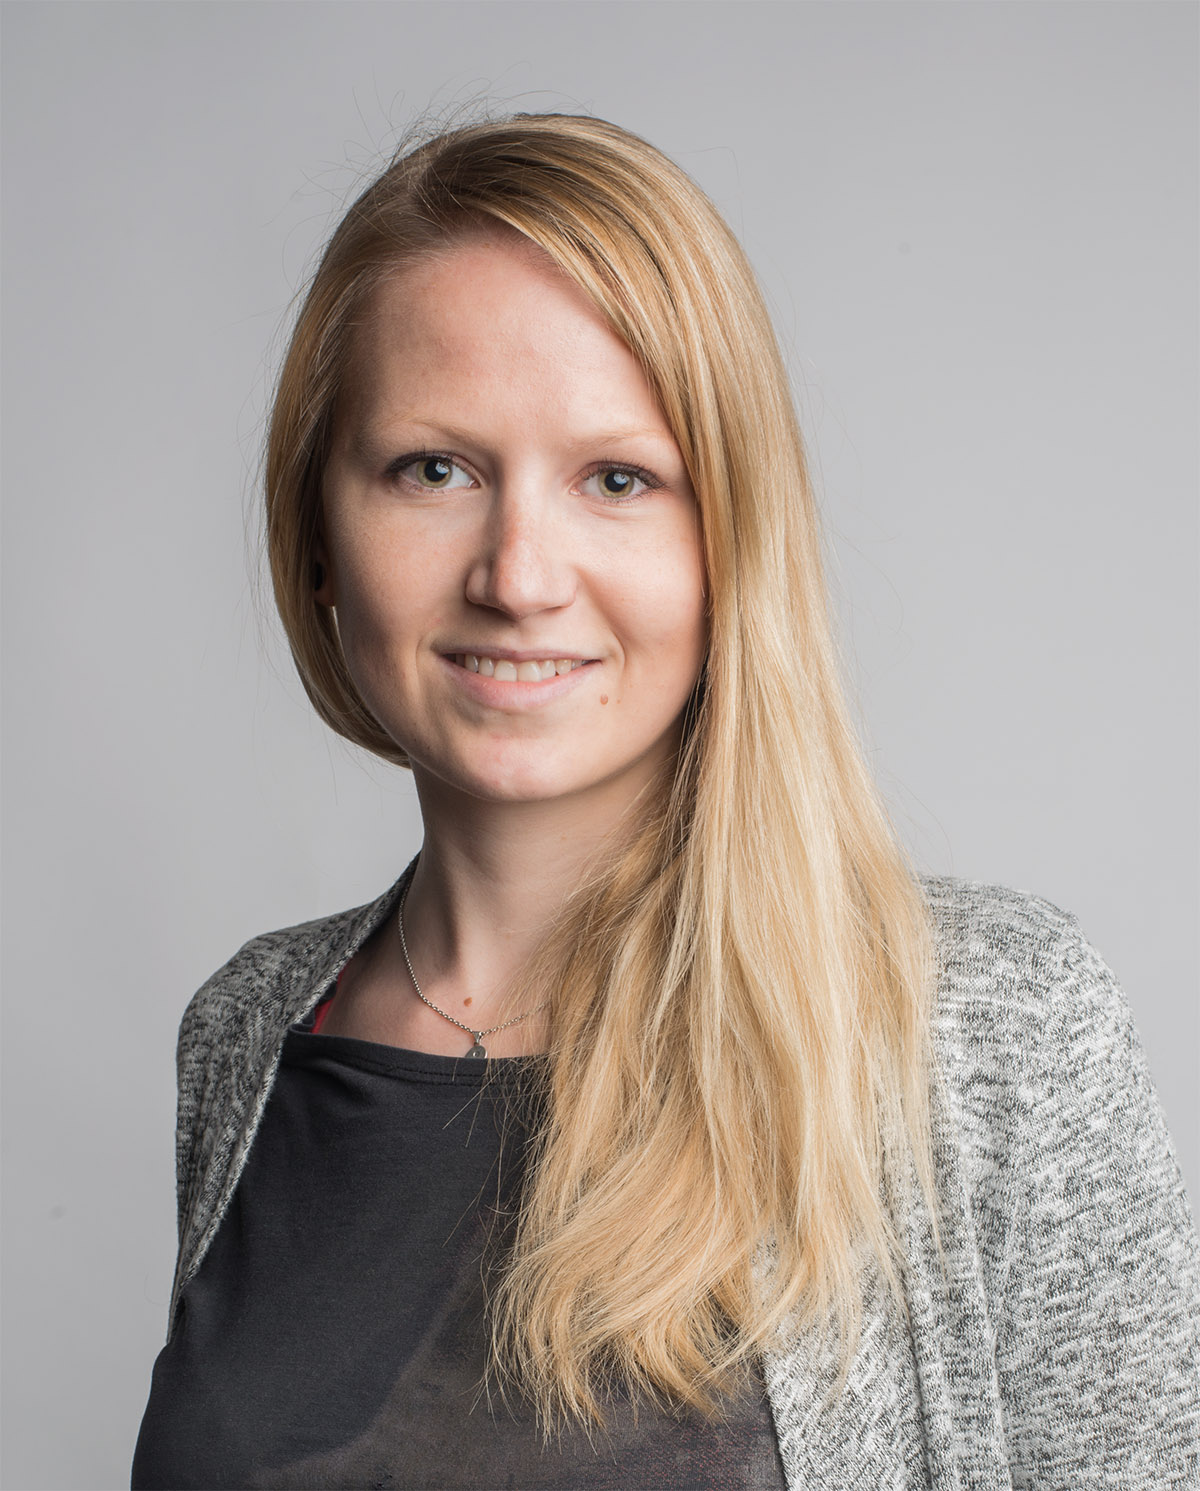 Caroline Hinterseer